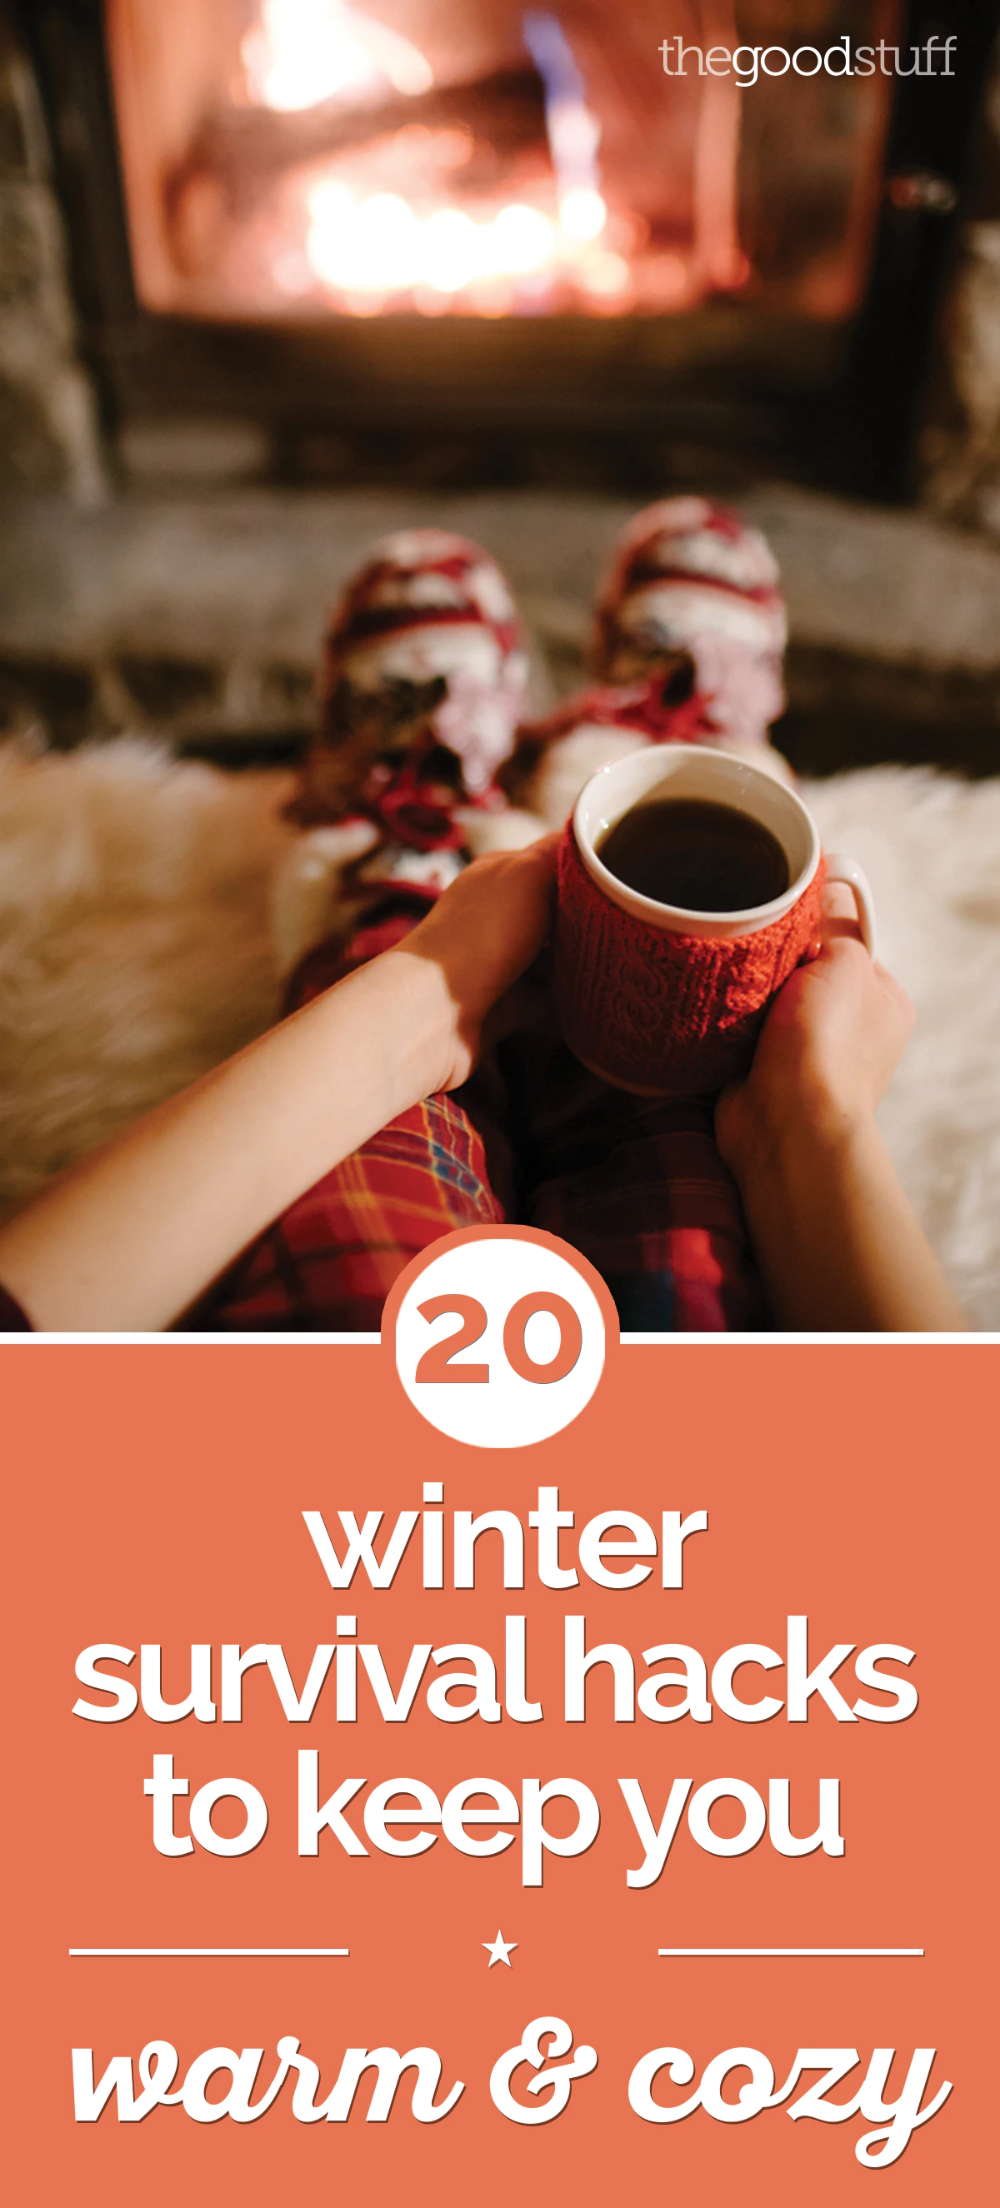 20 Winter Survival Hacks to Keep You Warm & Cozy - thegoodstuff